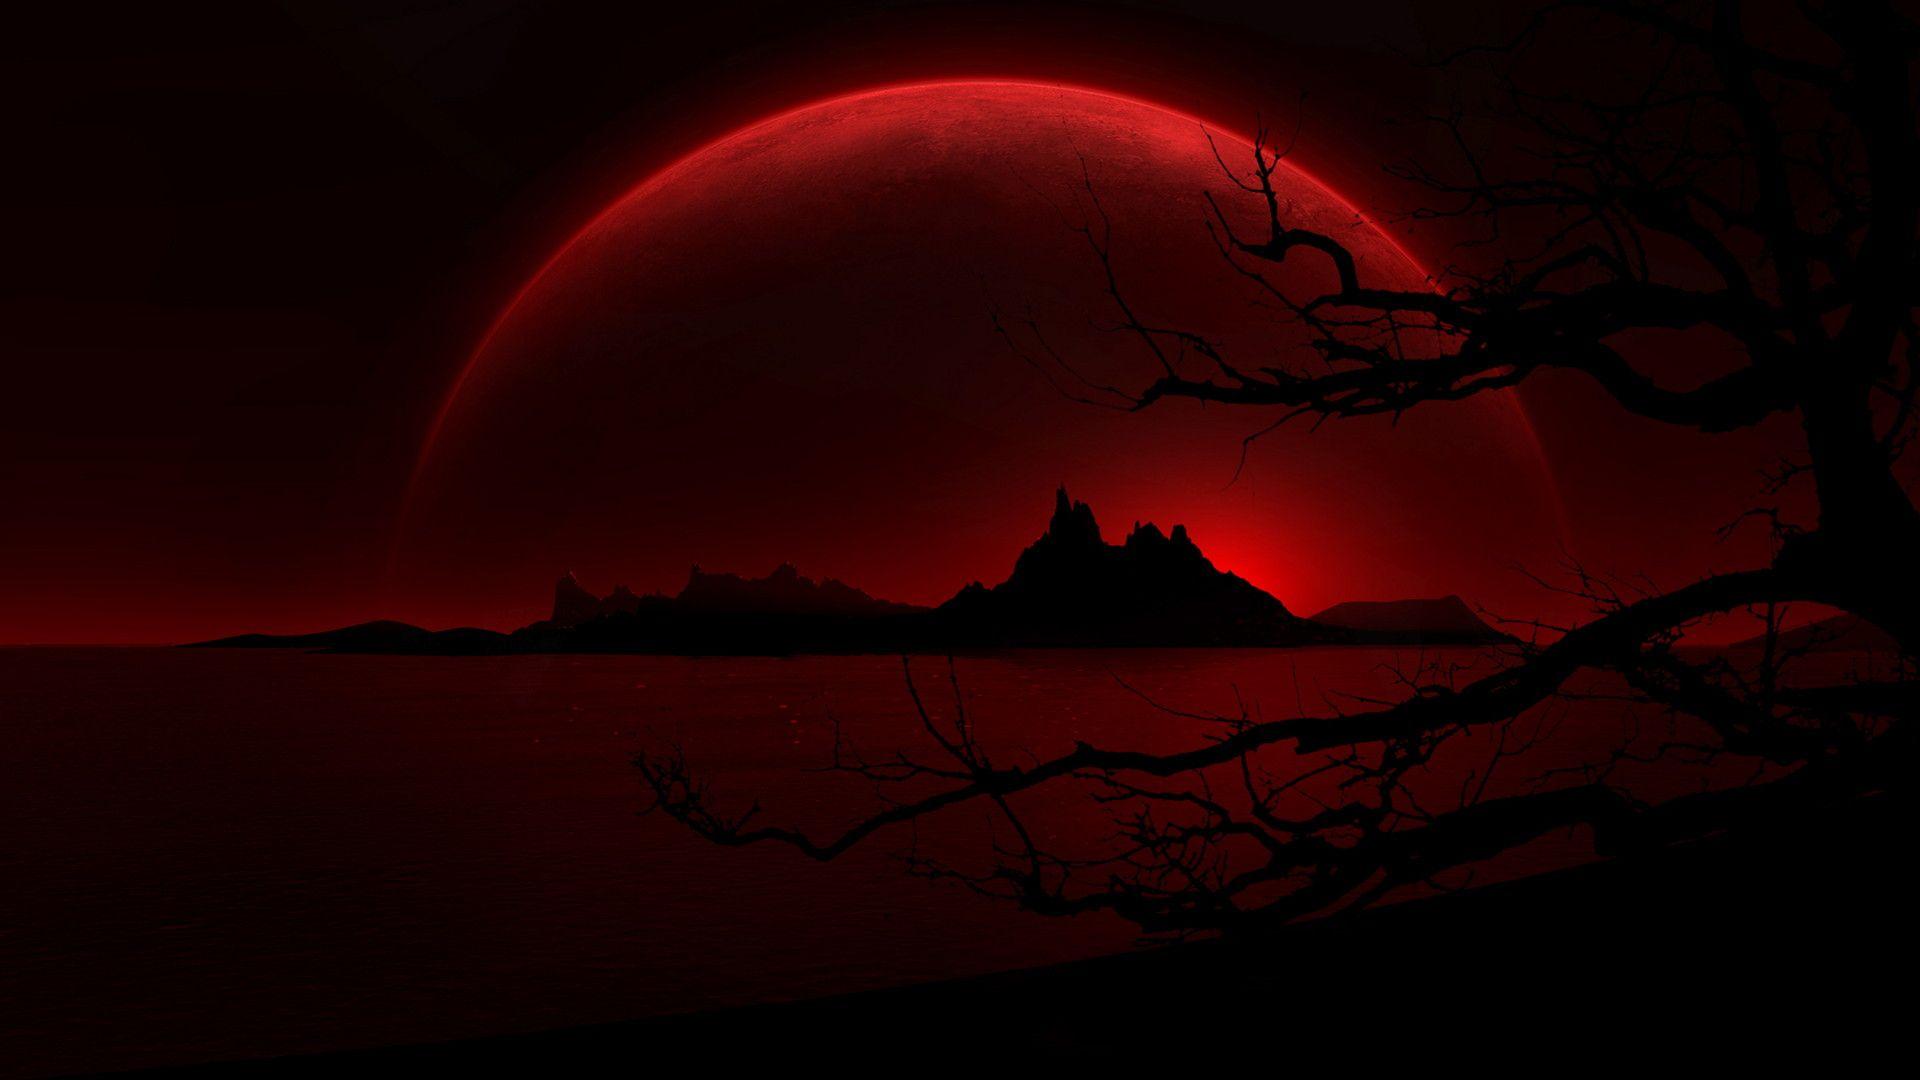 Red Moon Wallpaper Dark Red Wallpaper Dark Landscape Hd Dark Wallpapers